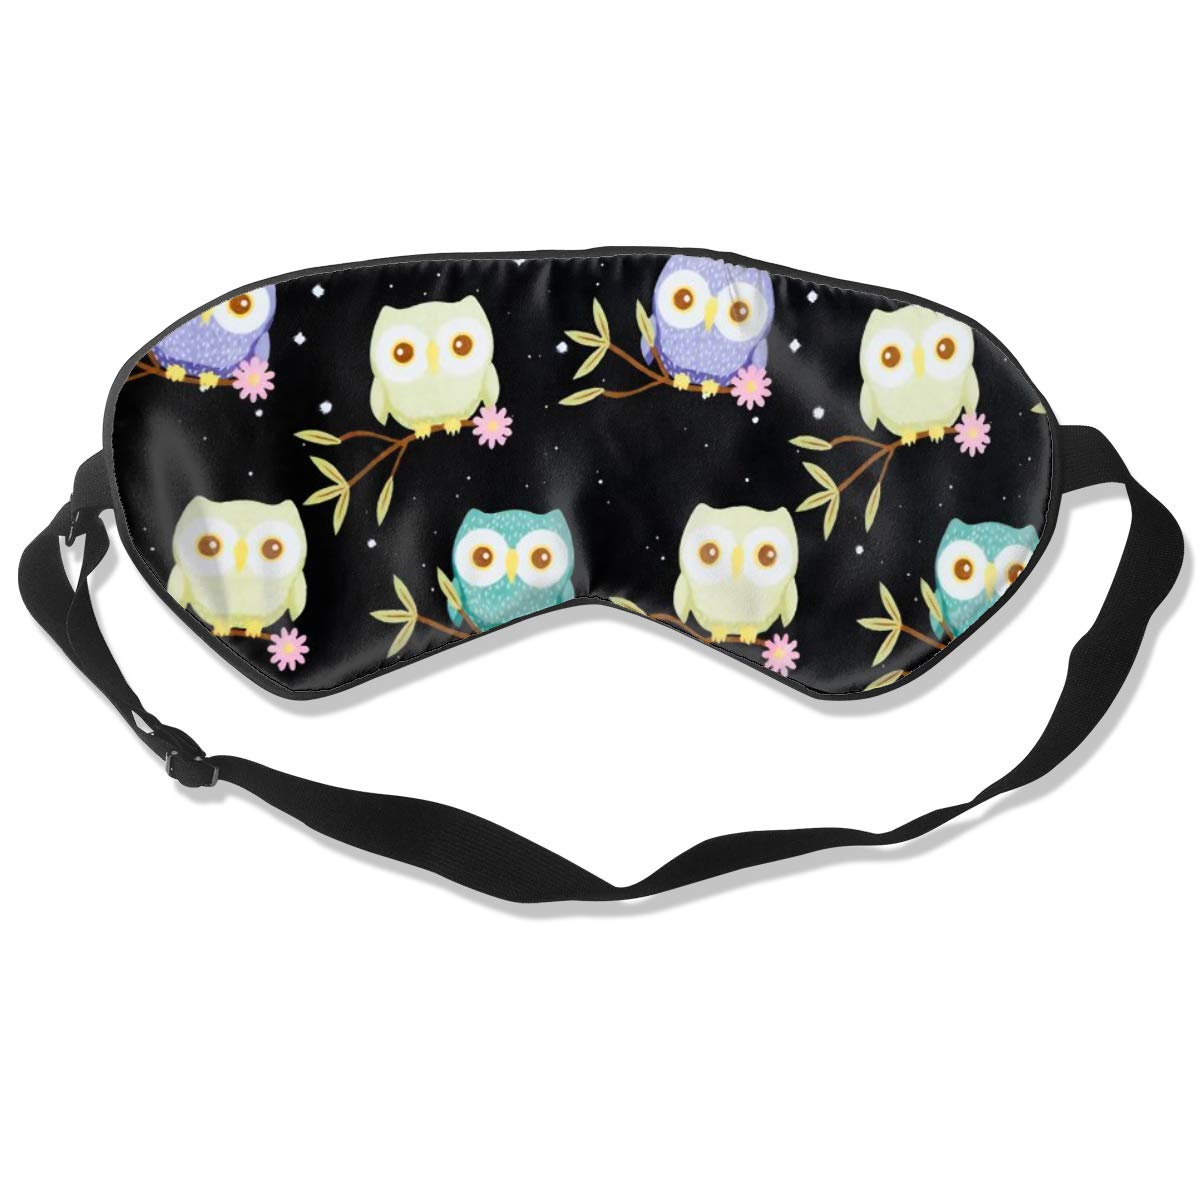 Darkt Owl Sleep Mask Funny Lightweight Blindfold Cover Eyeshade for Women Men Kid with Adjustable Strap Plane Travel Naps Shift Works Games